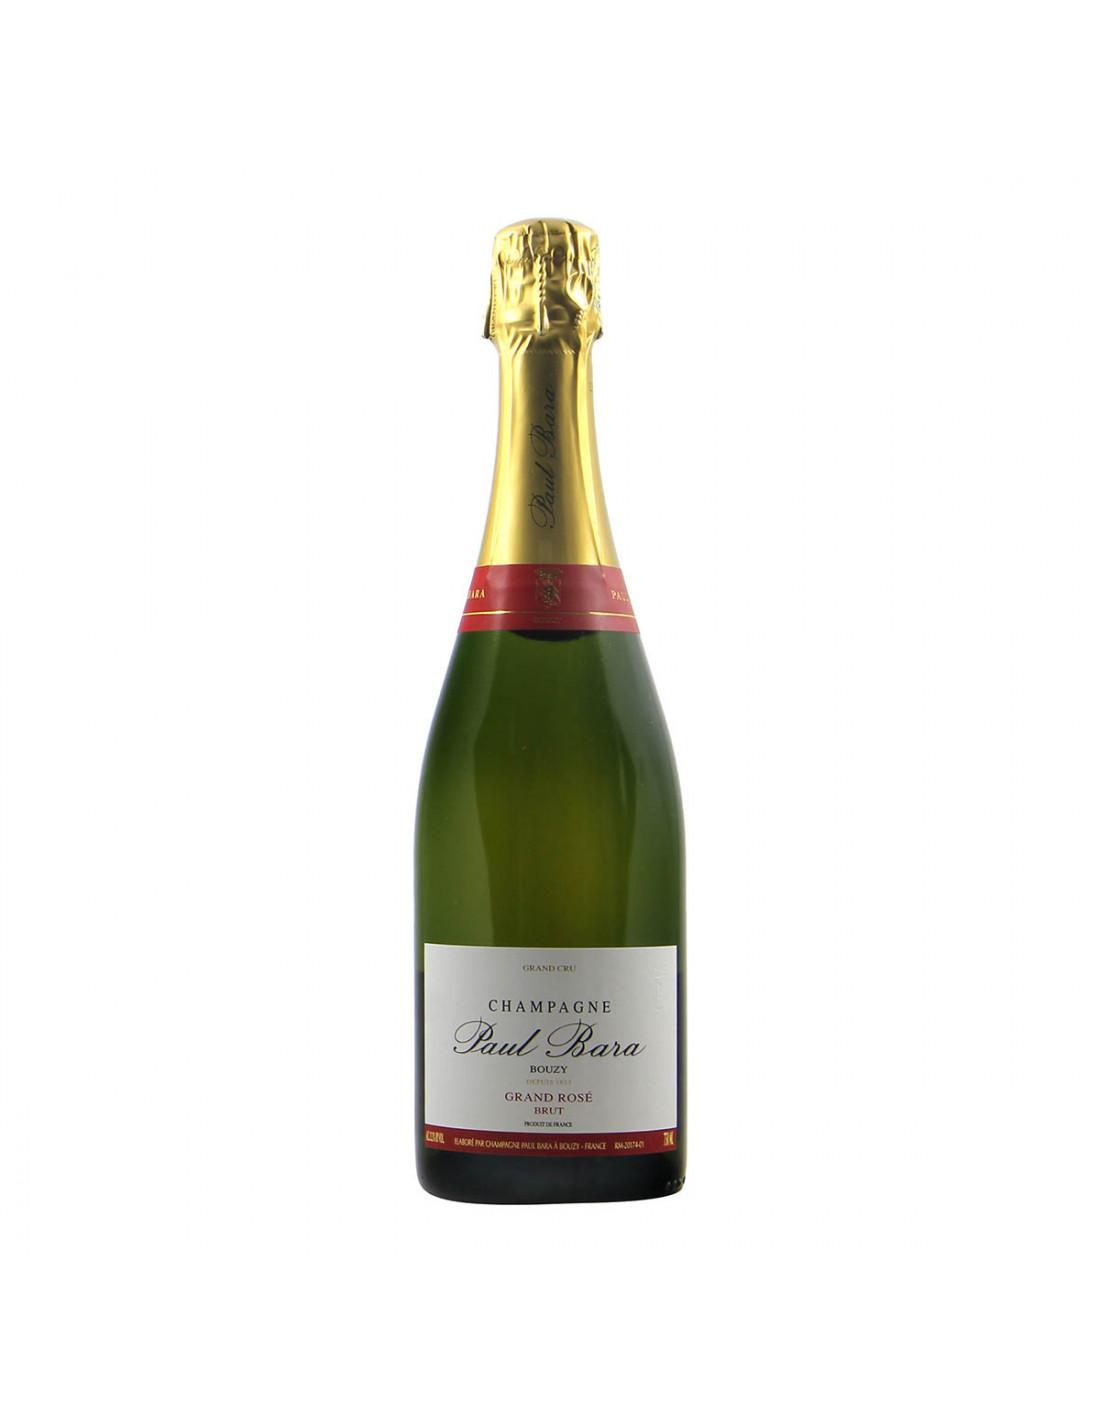 Paul Bara Champagne Grand Rose Brut Grandi Bottiglie